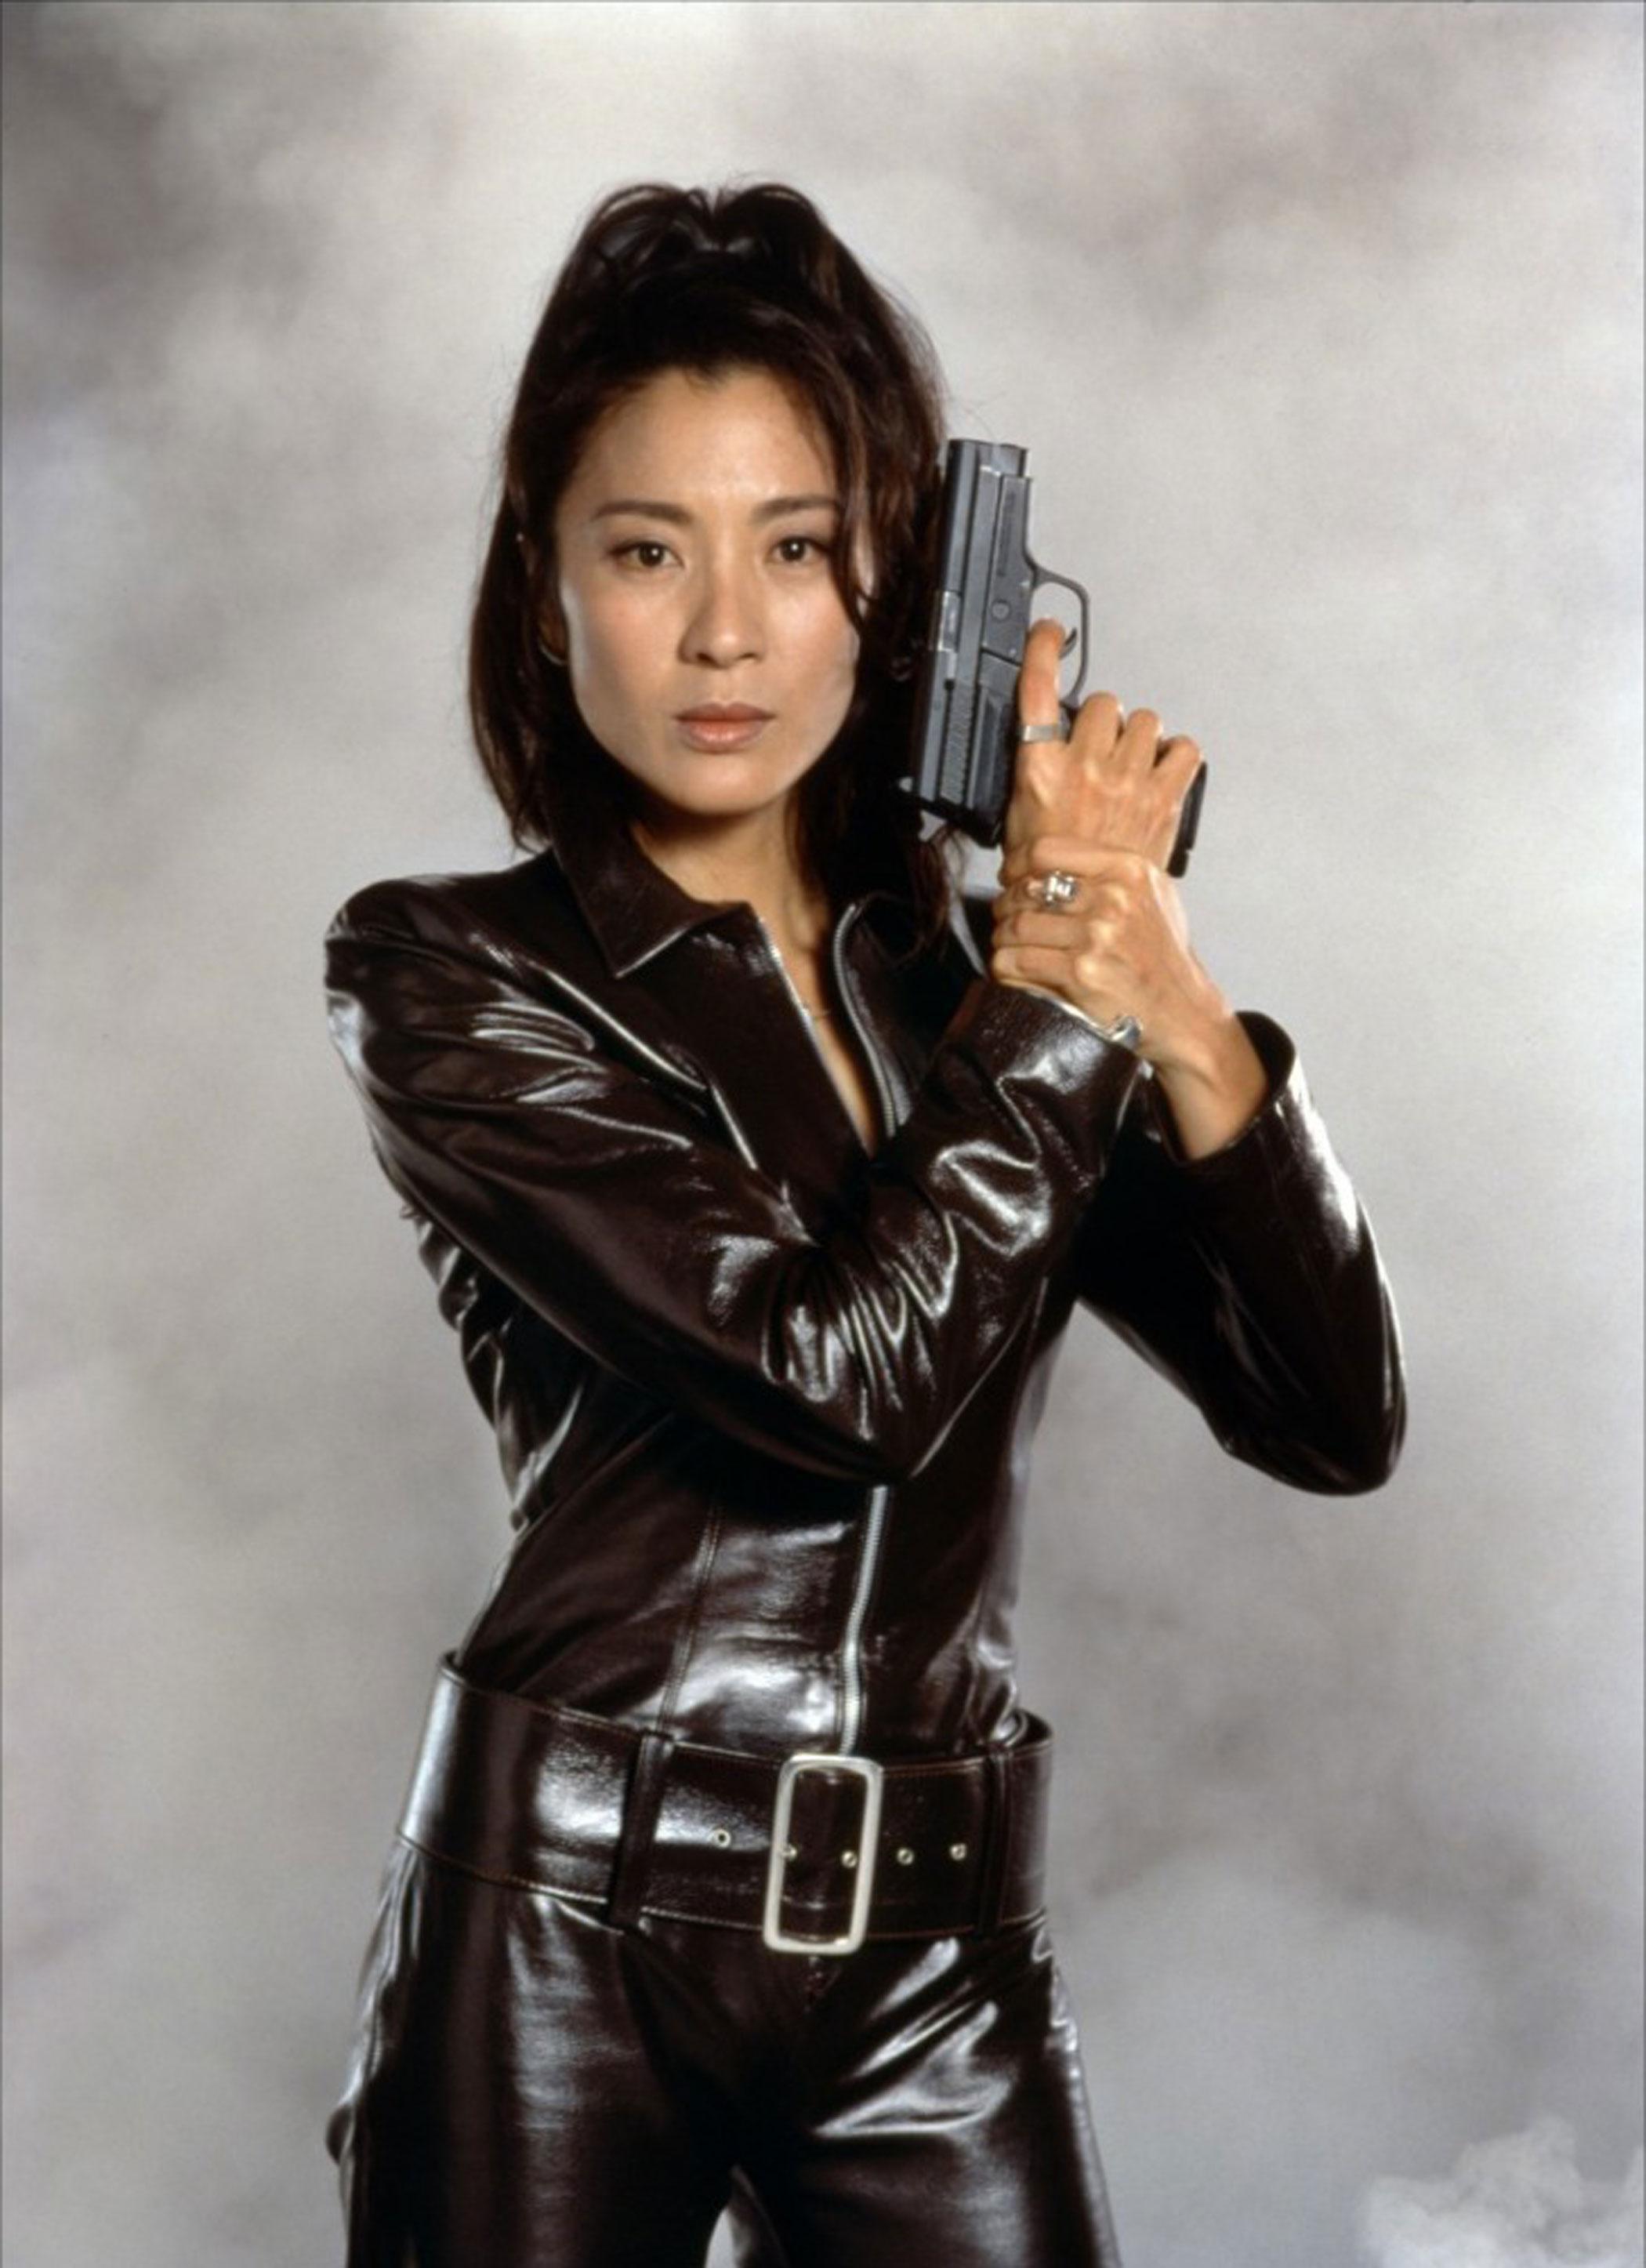 Michelle Yeoh (Wai Lin) / 'Tomorrow Never Dies'